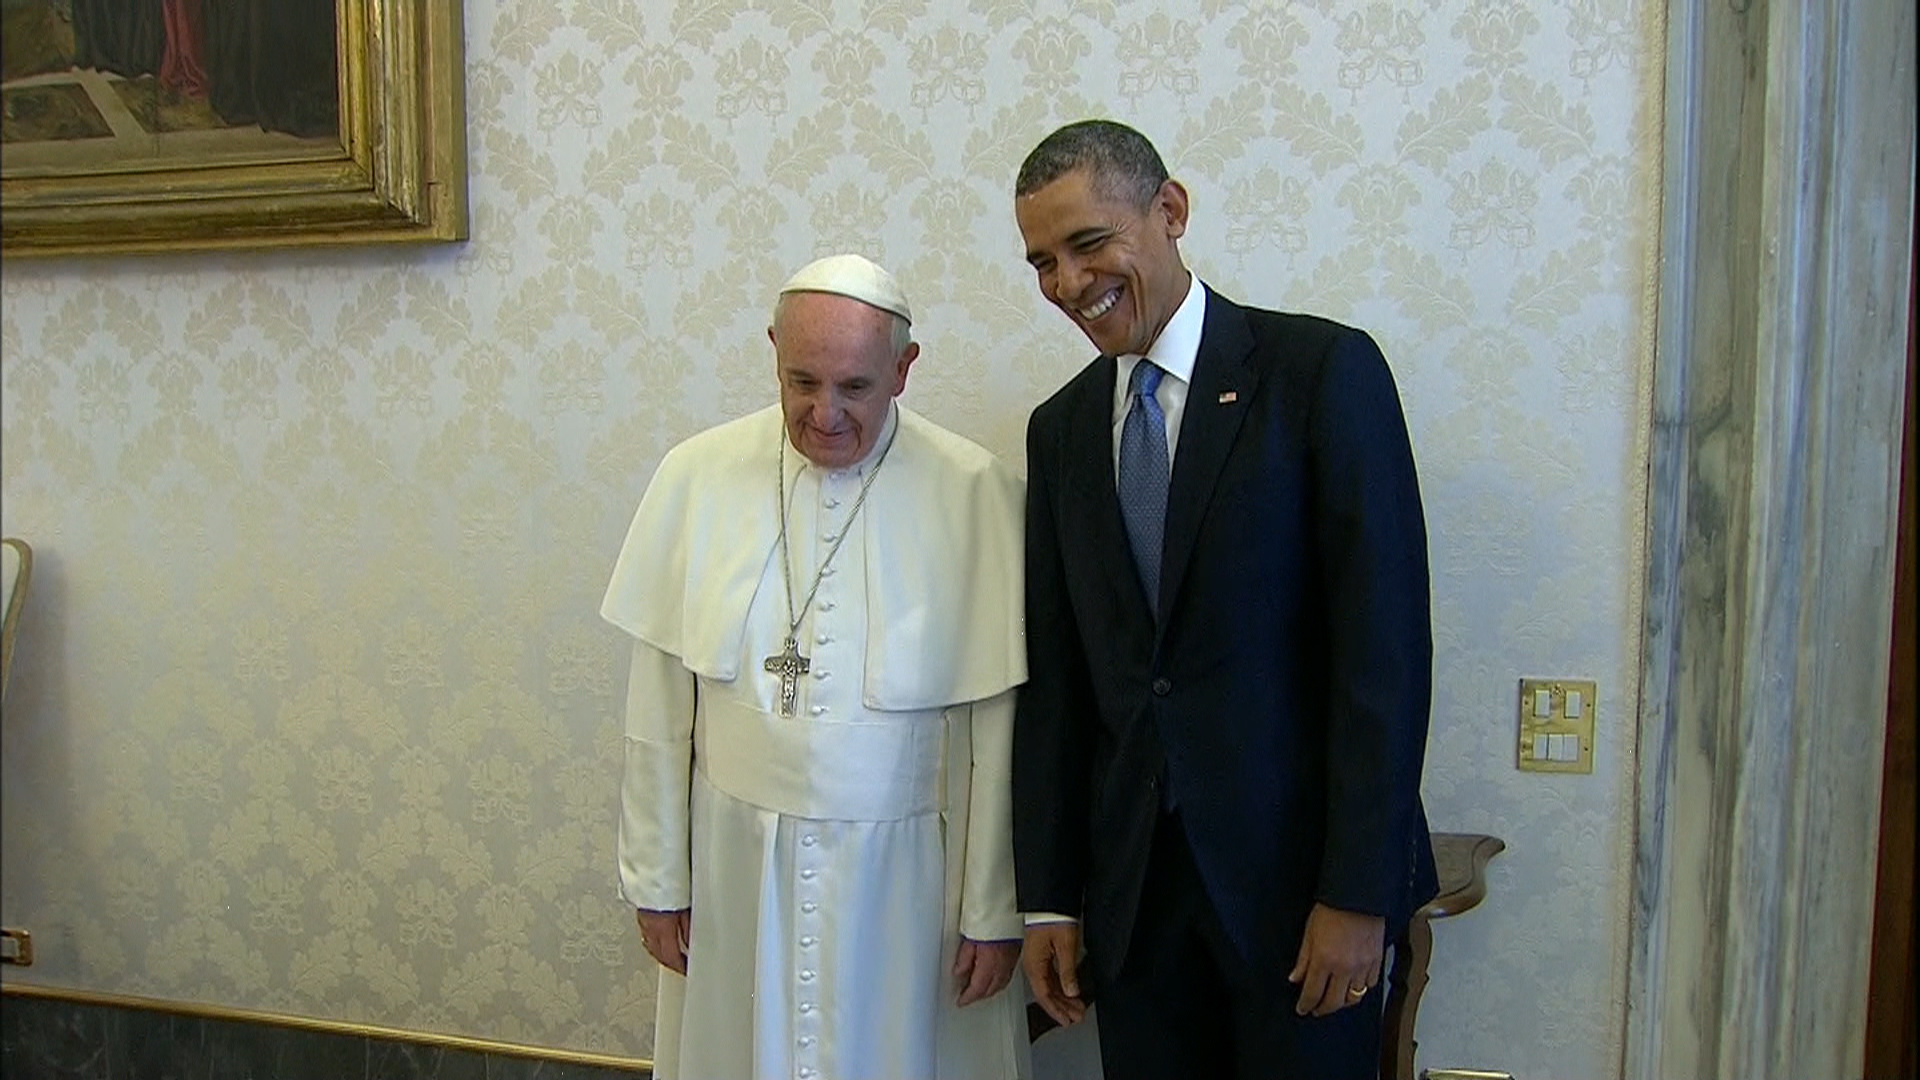 Pope and president, both progressives